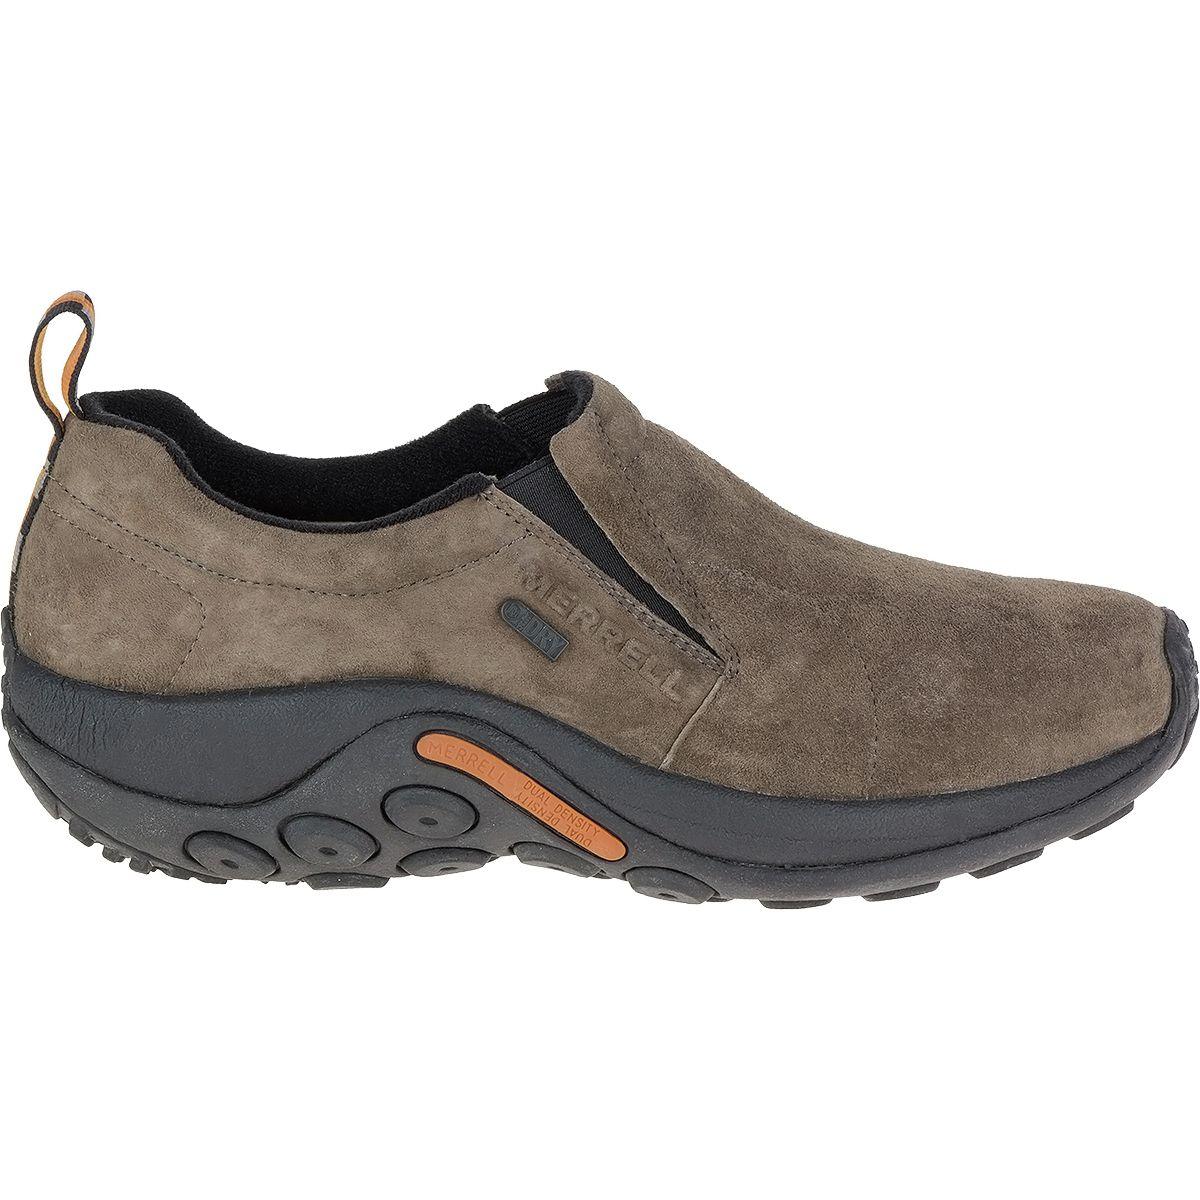 Merrell Jungle Moc Waterproof Shoe